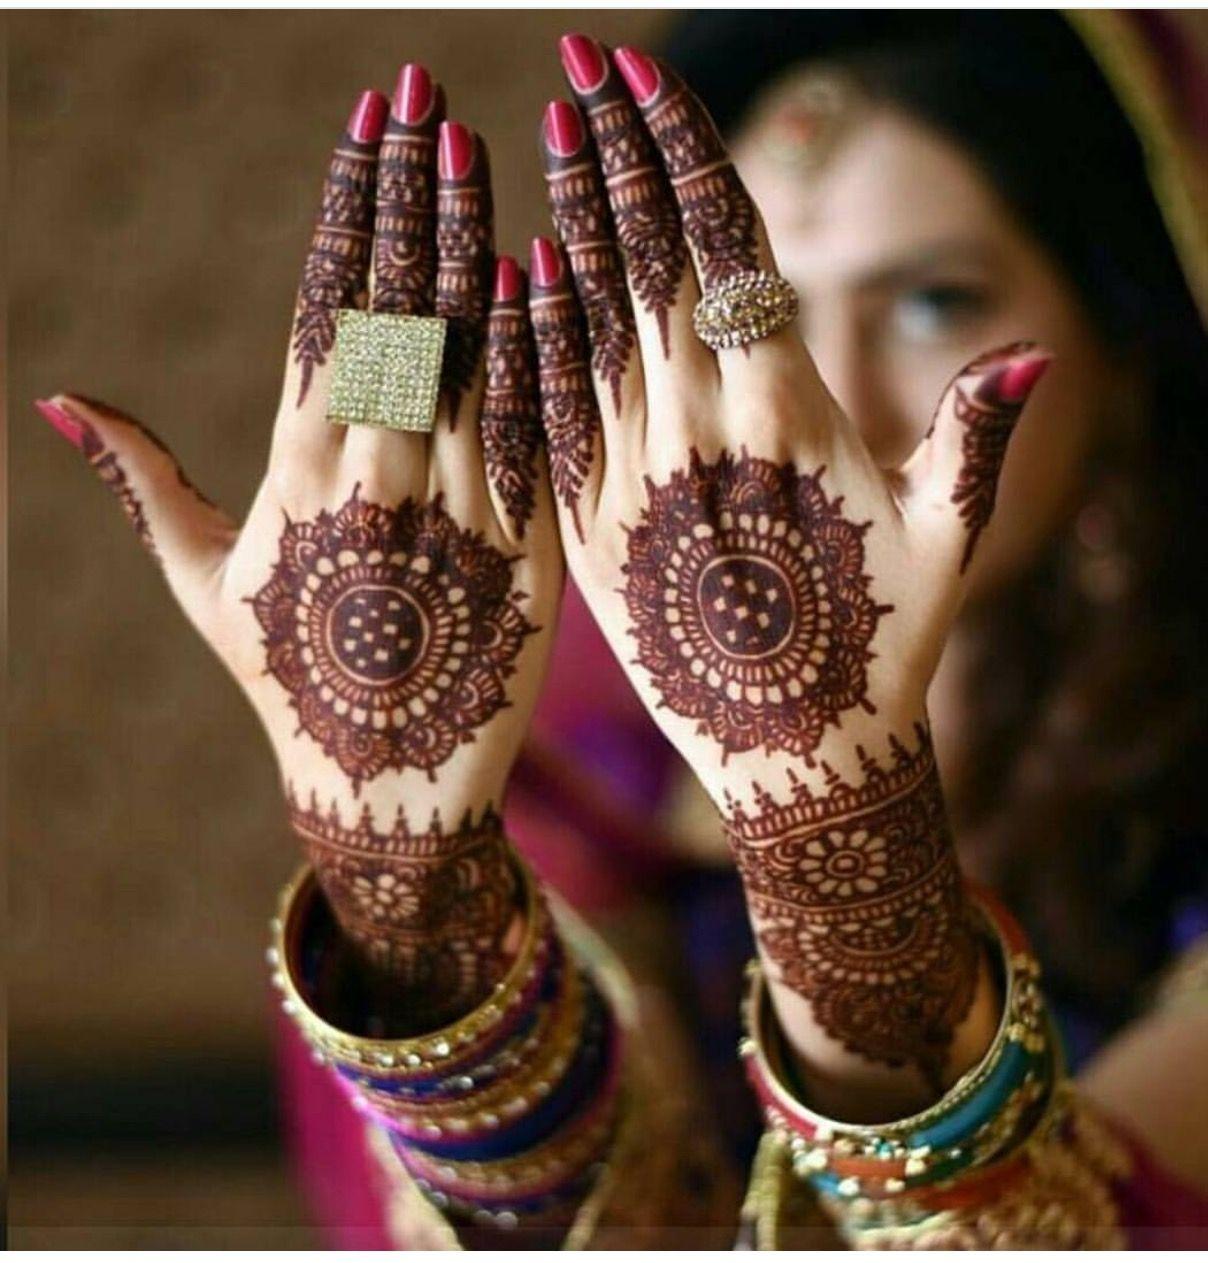 Pin By Neetu Gagan Gauba On Mehndi: Pin By Gagan Sandhu On Bridal Inspo